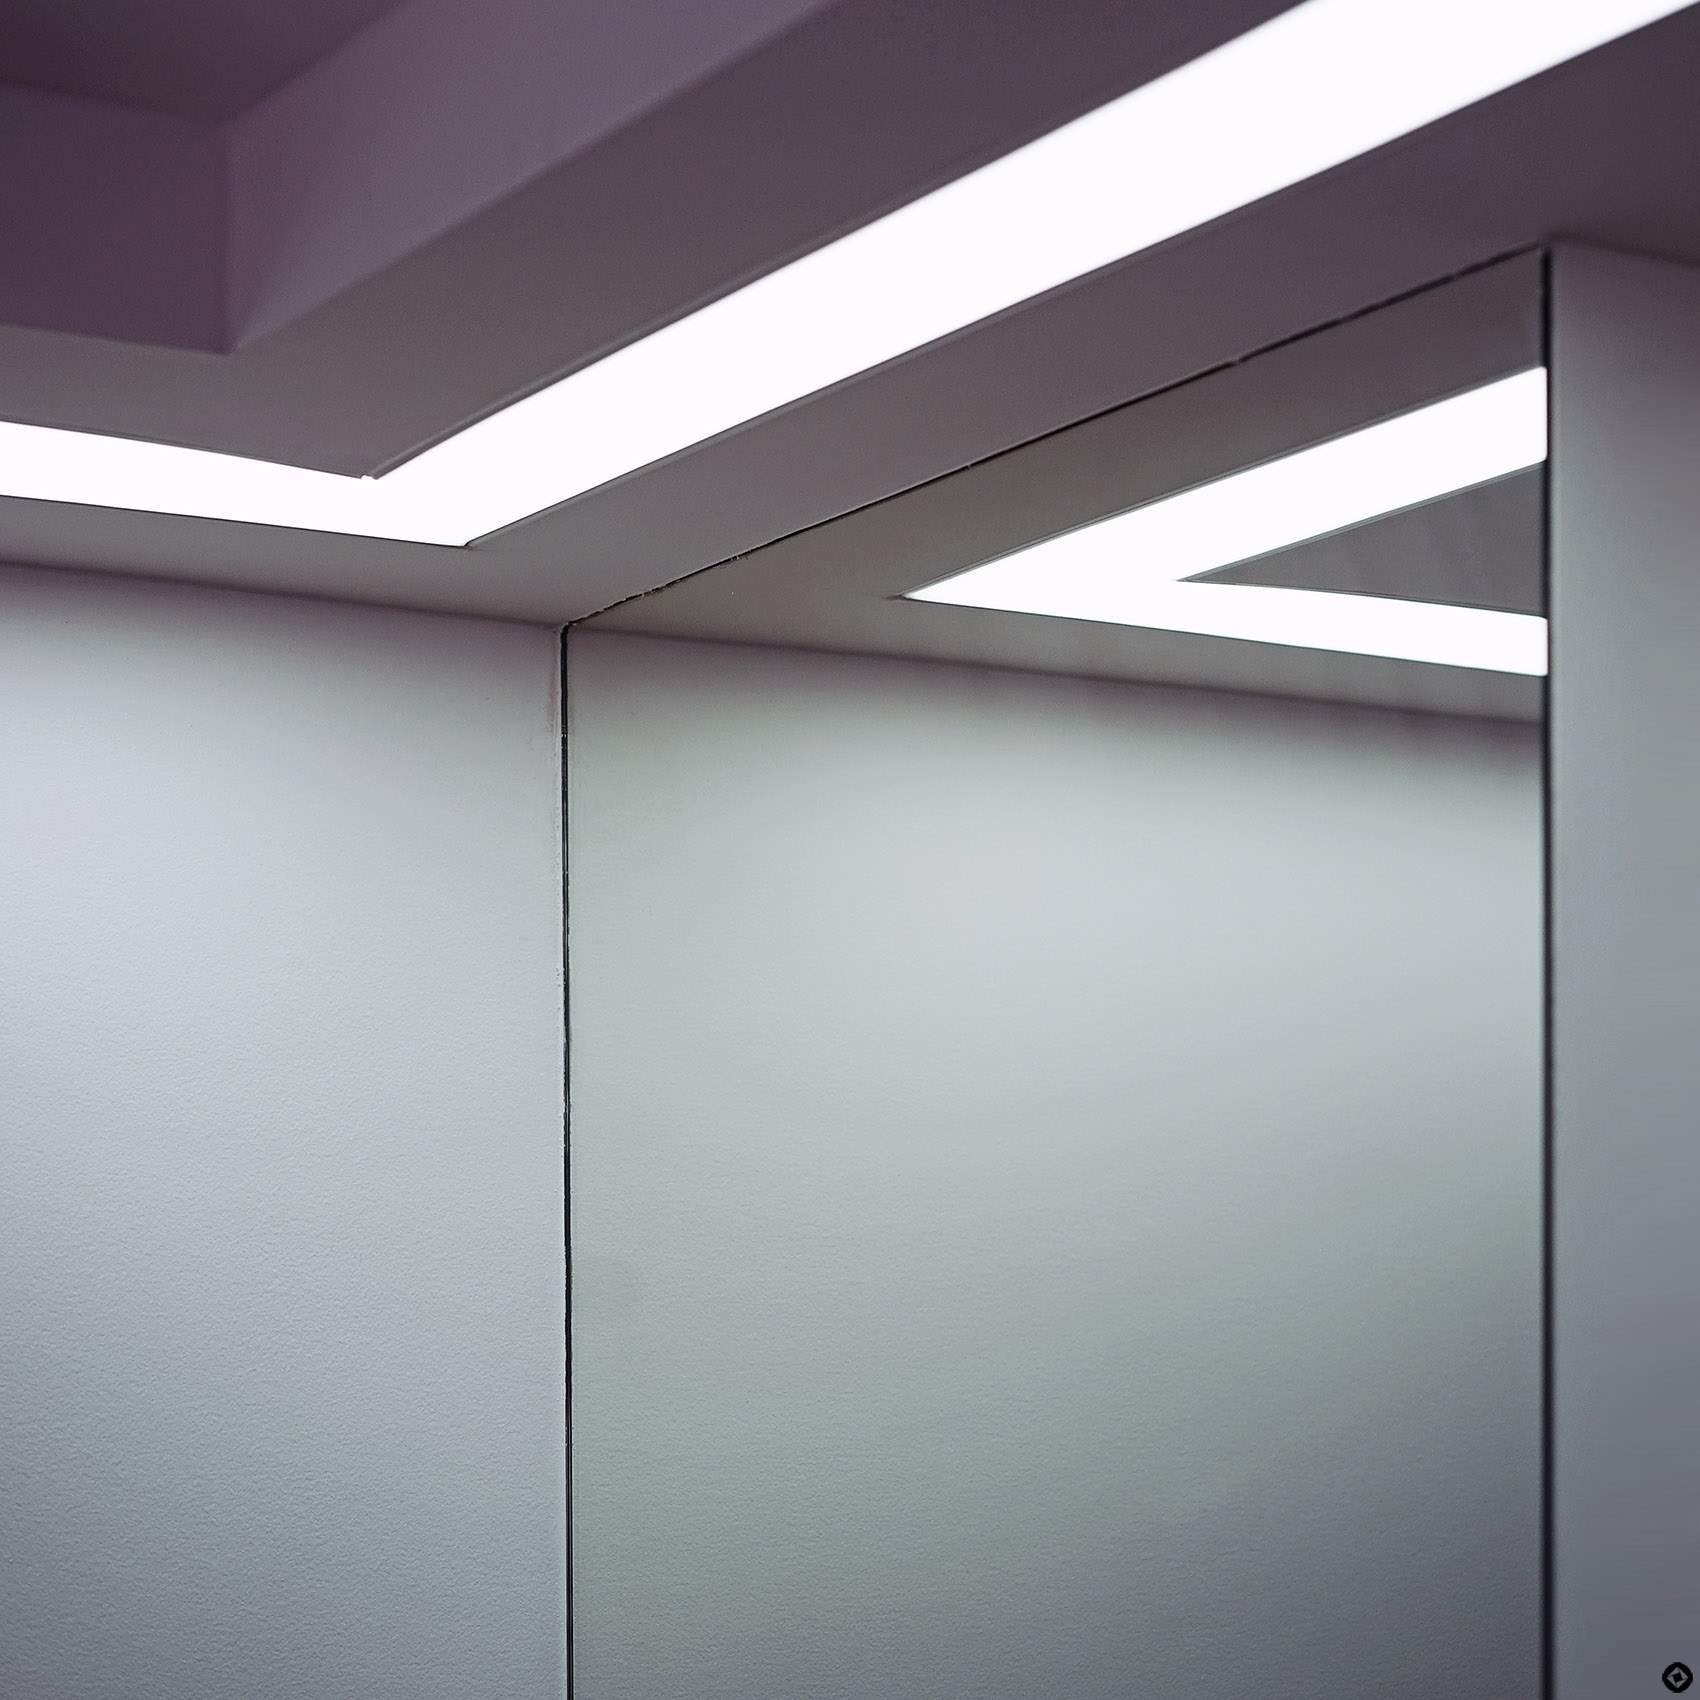 appartement-architecte-david-bitton-blog-design_5